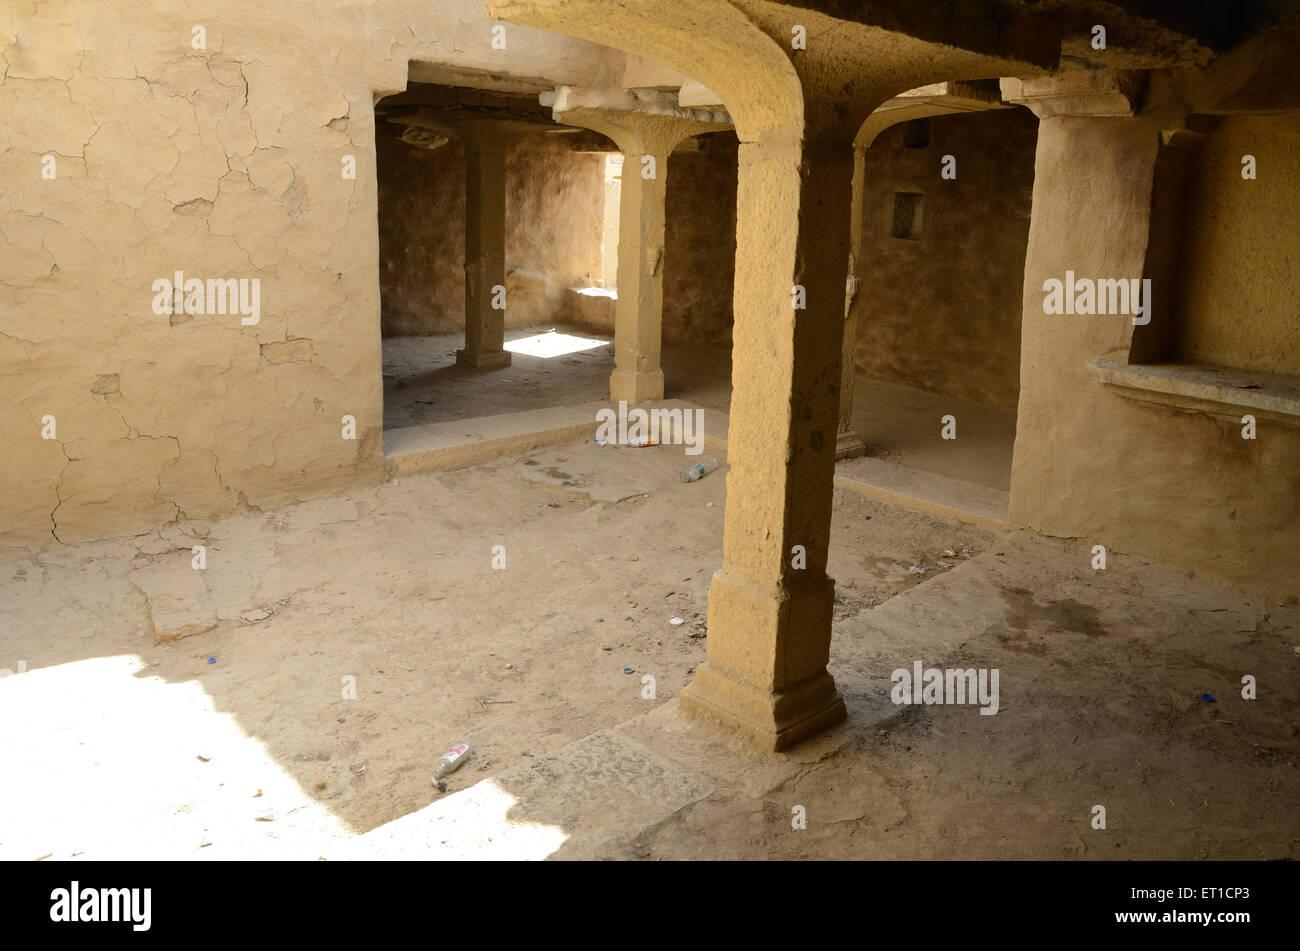 Interior House Of Abandoned Village In Kuldhara Near Jaisalmer Rajasthan  India   Stock Image